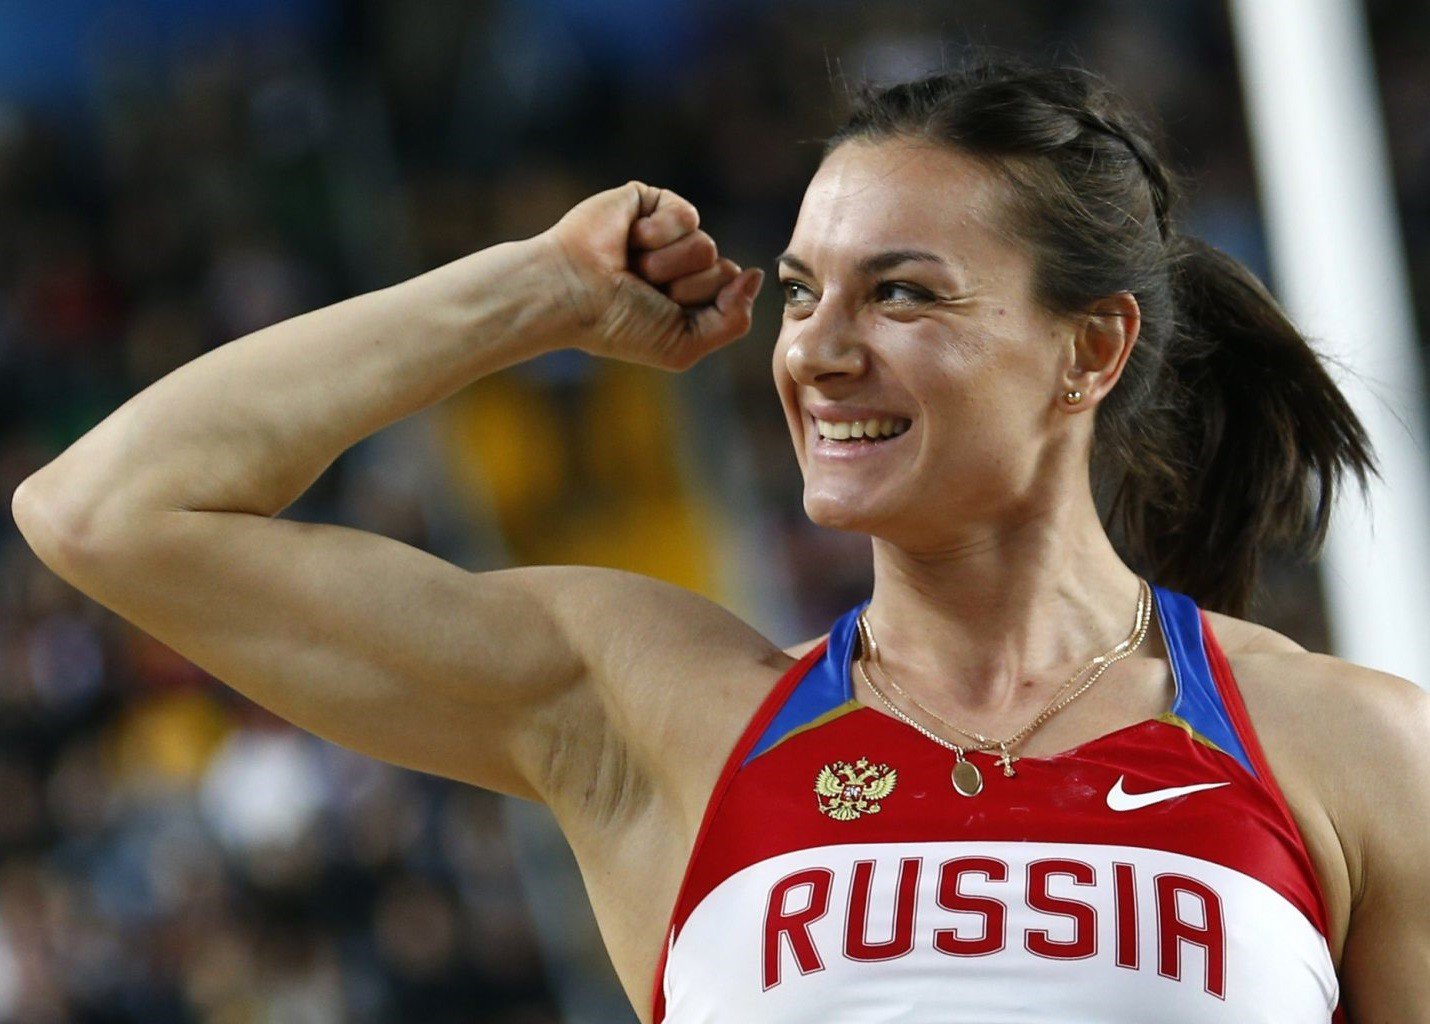 Фото русских спортсменов — photo 5